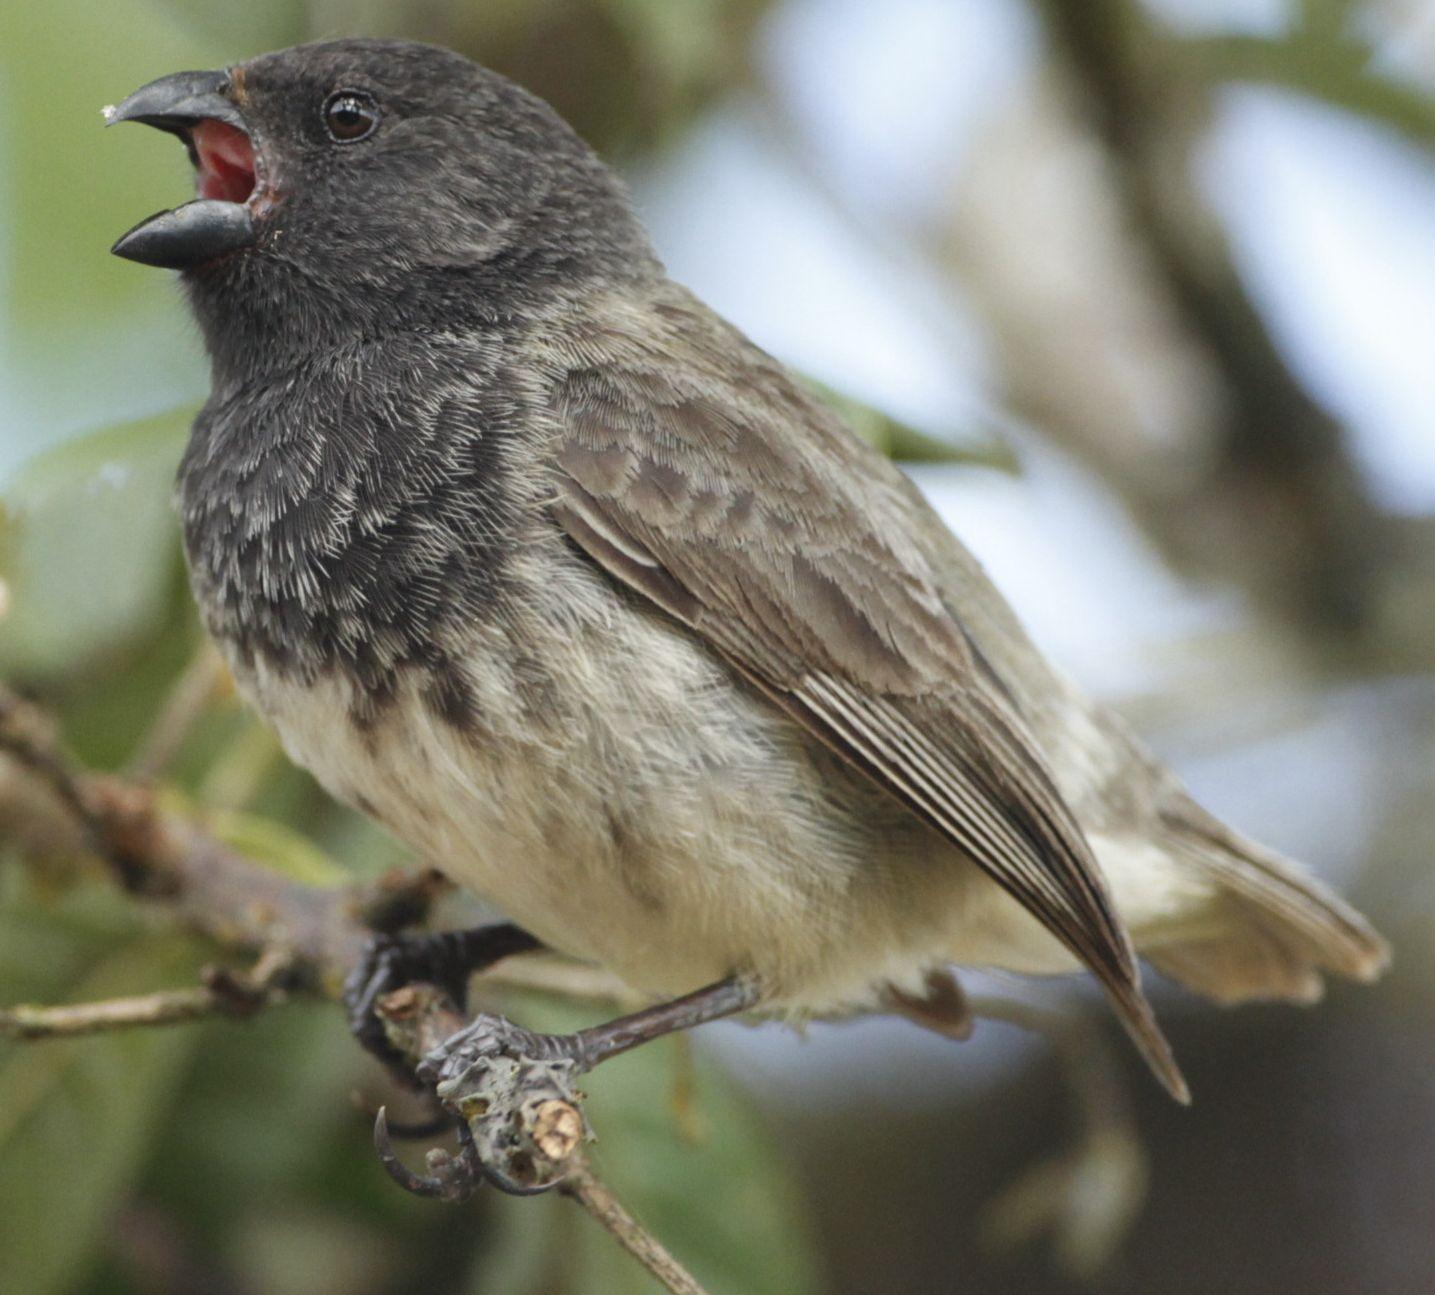 Small Tree-Finch Photo by Michi Dvorak